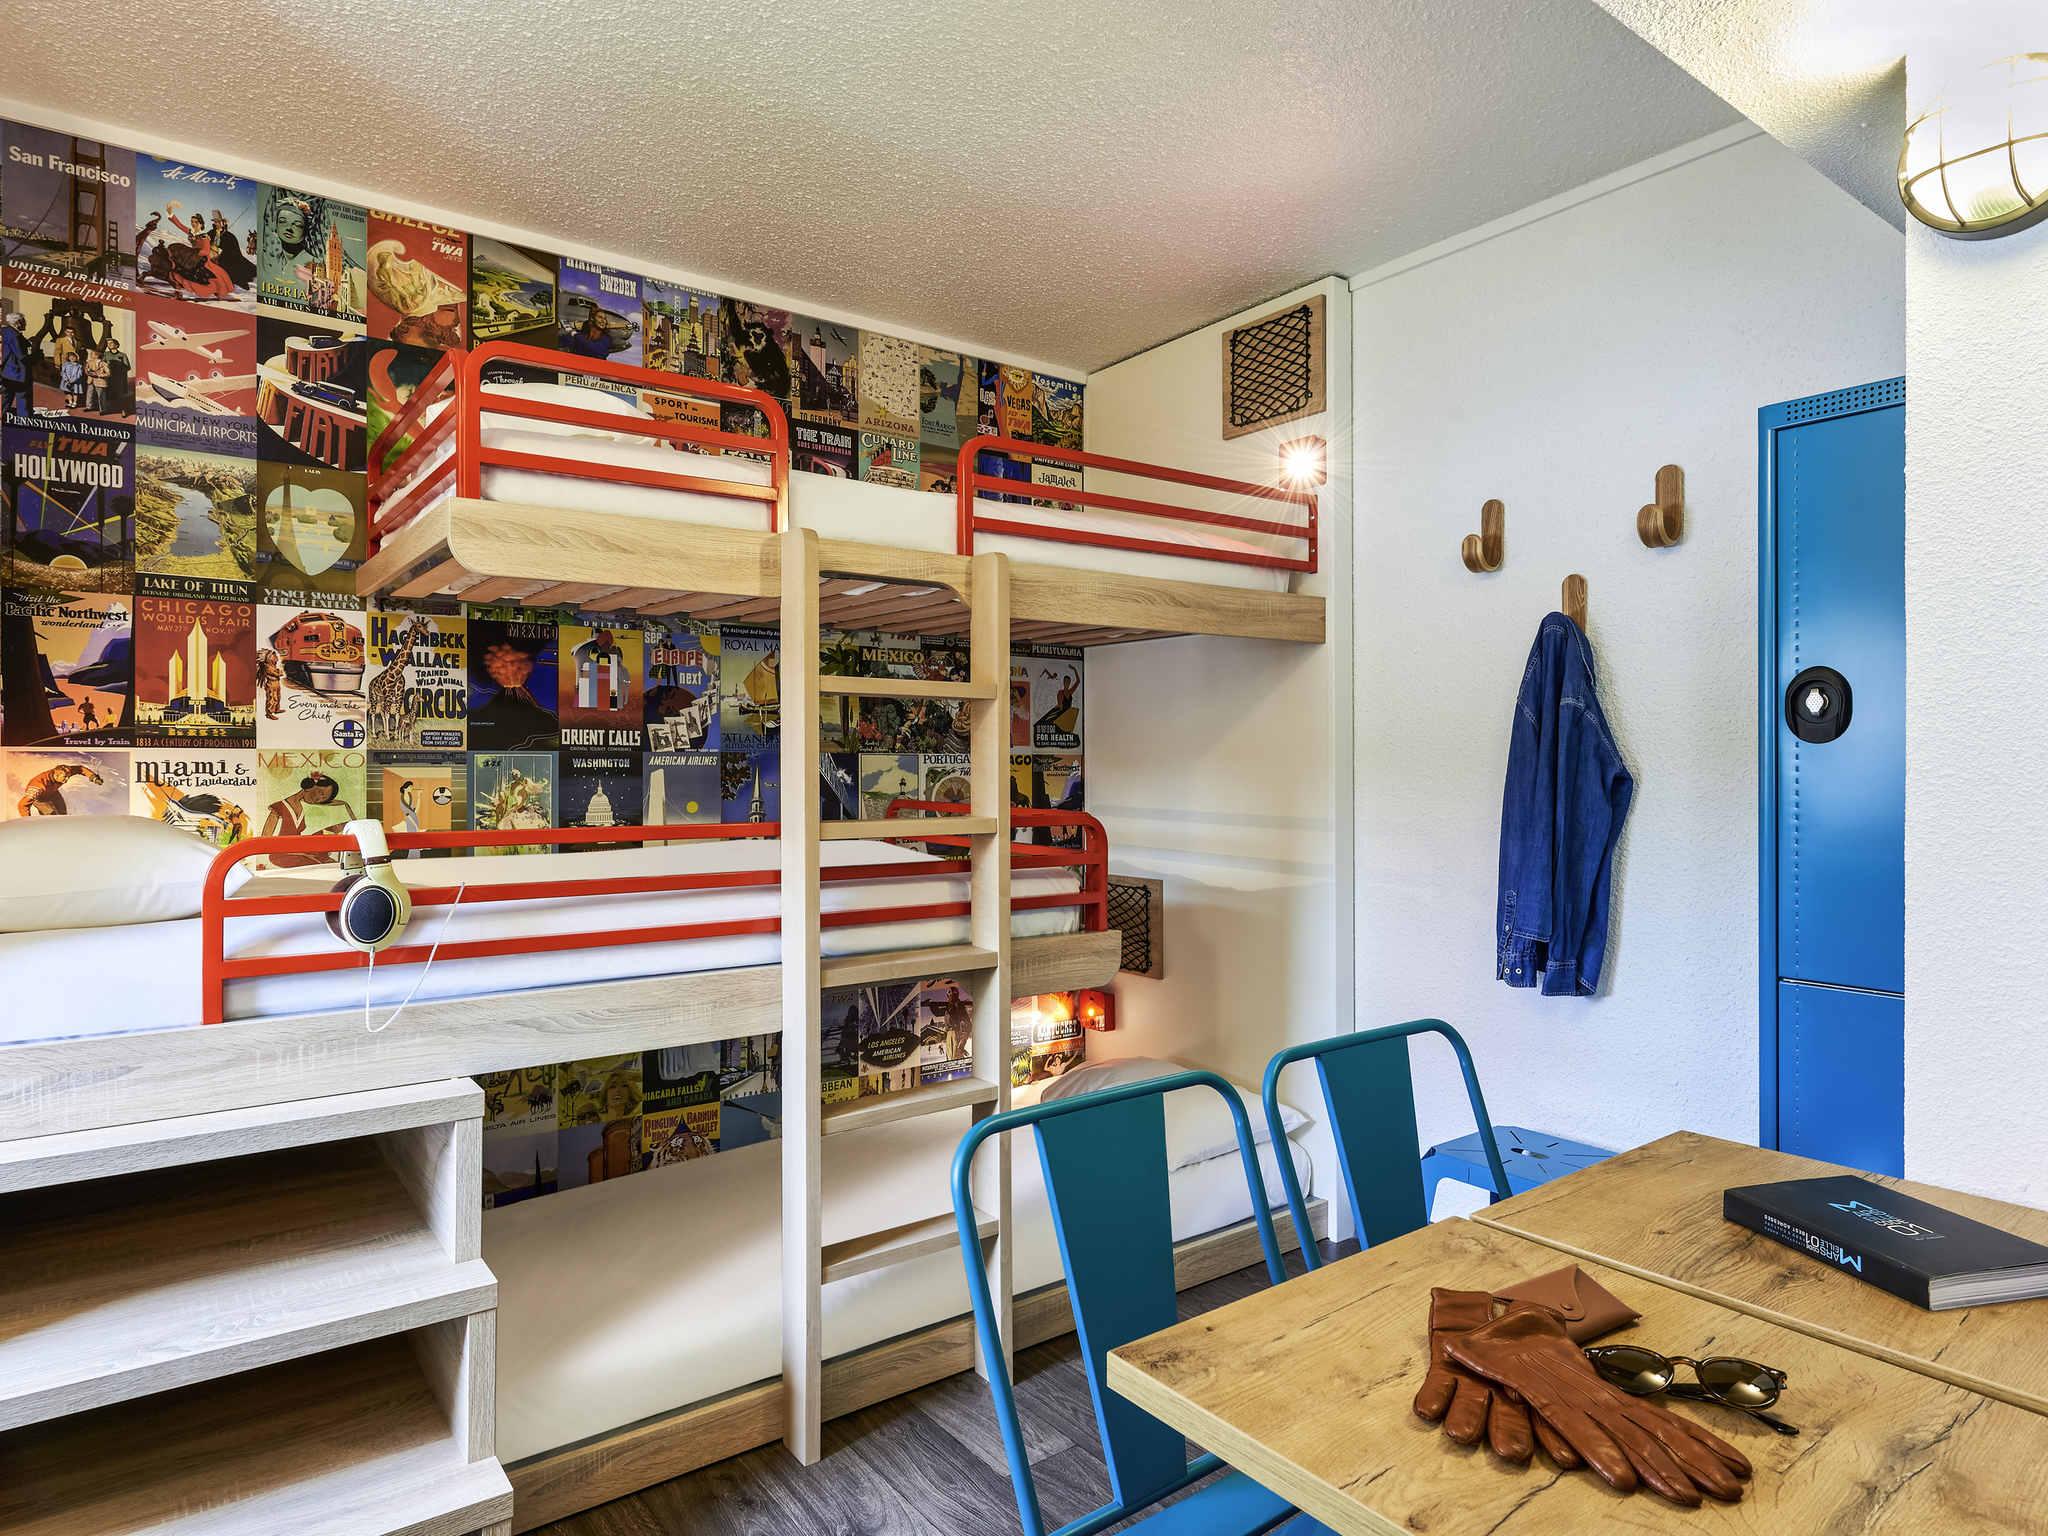 hotel a evry hotelf1 evry a6. Black Bedroom Furniture Sets. Home Design Ideas